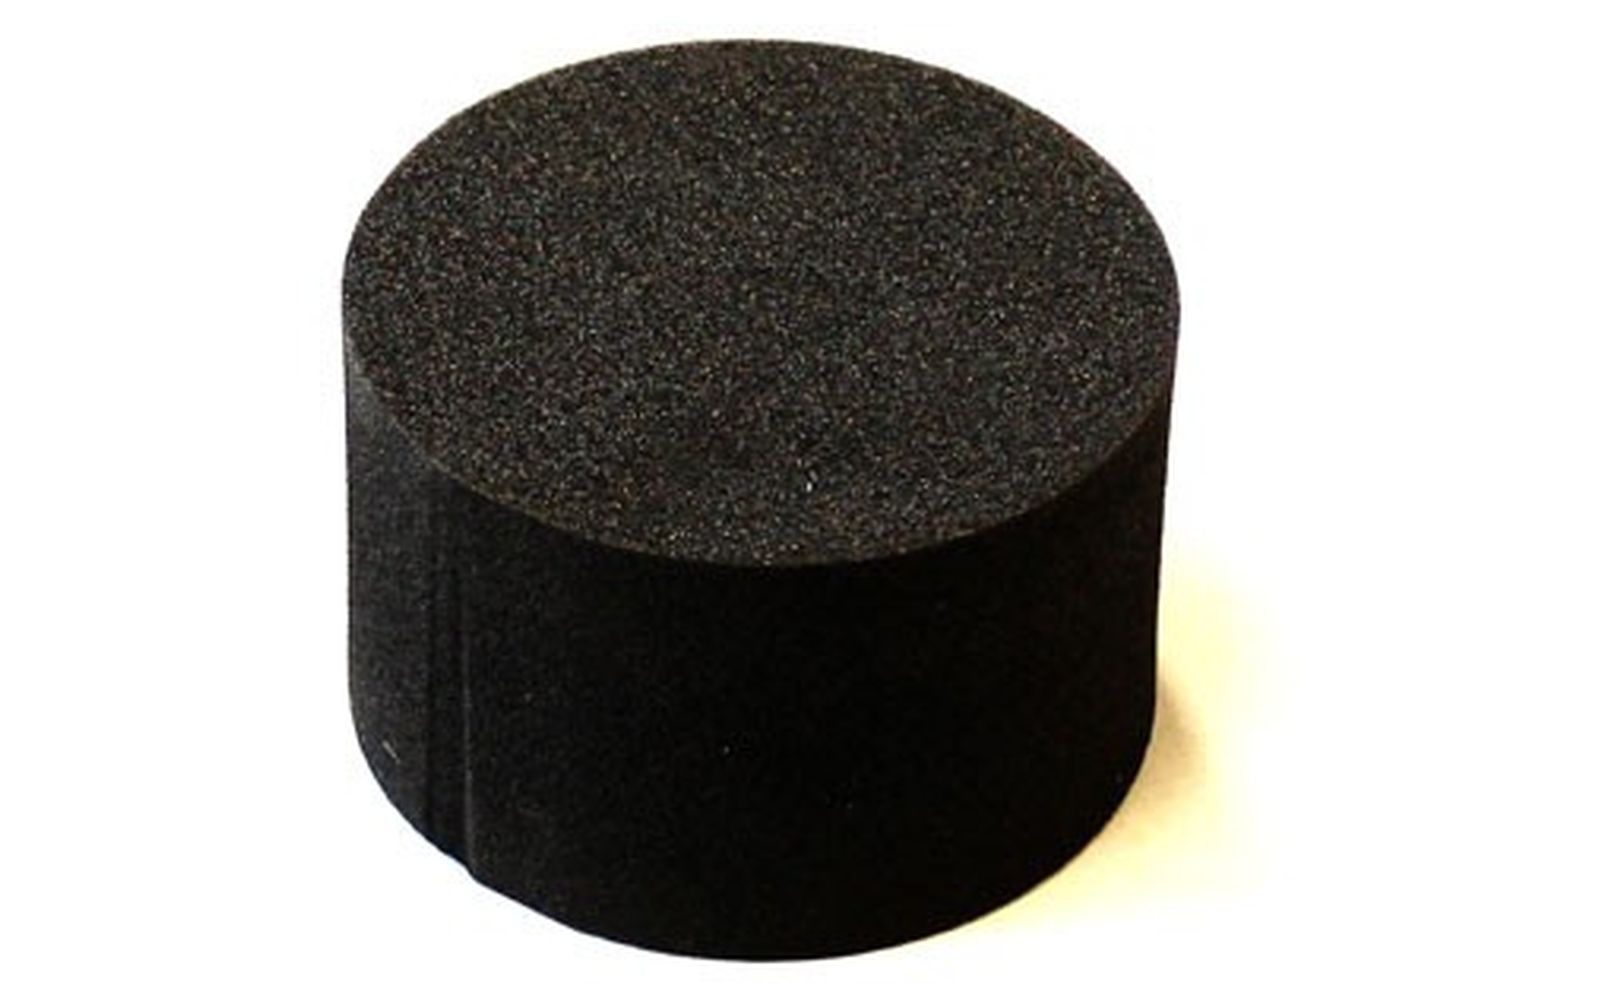 magic-fx-stage-shot-cores-for-fx-powder-10-pcs-